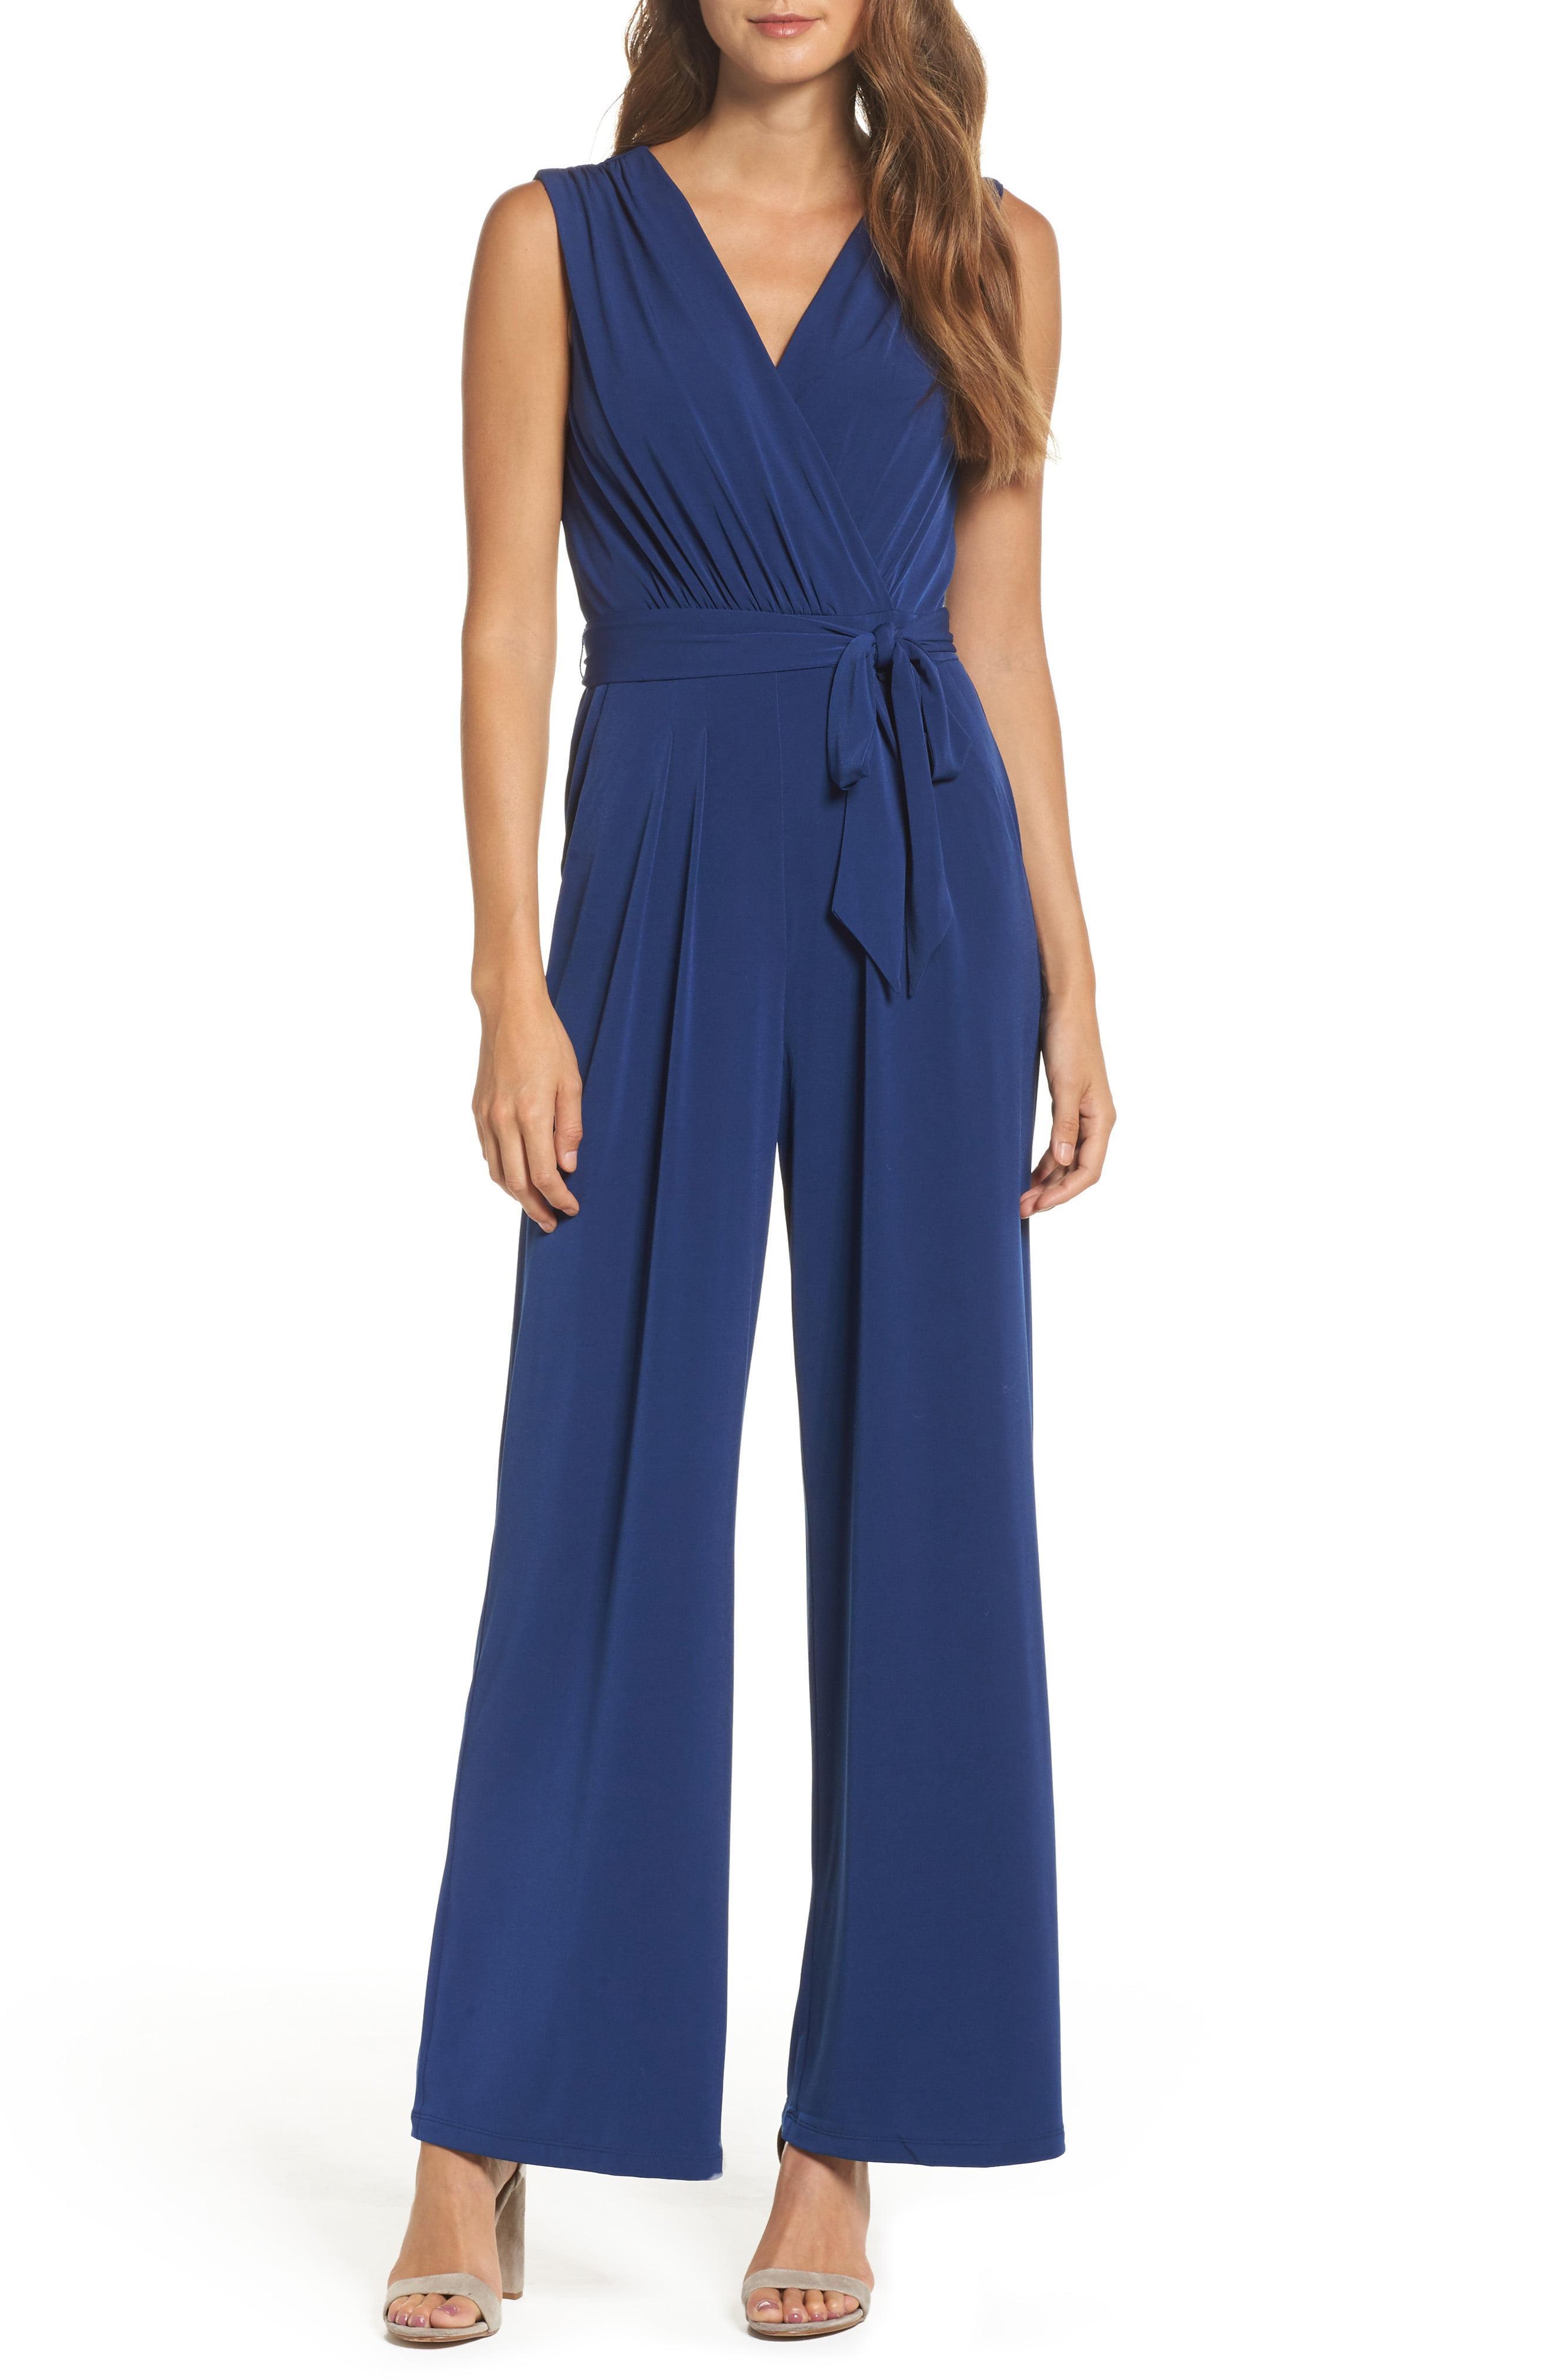 19b9a71e8d8 Lyst - Vince Camuto Faux Wrap Jersey Jumpsuit in Blue